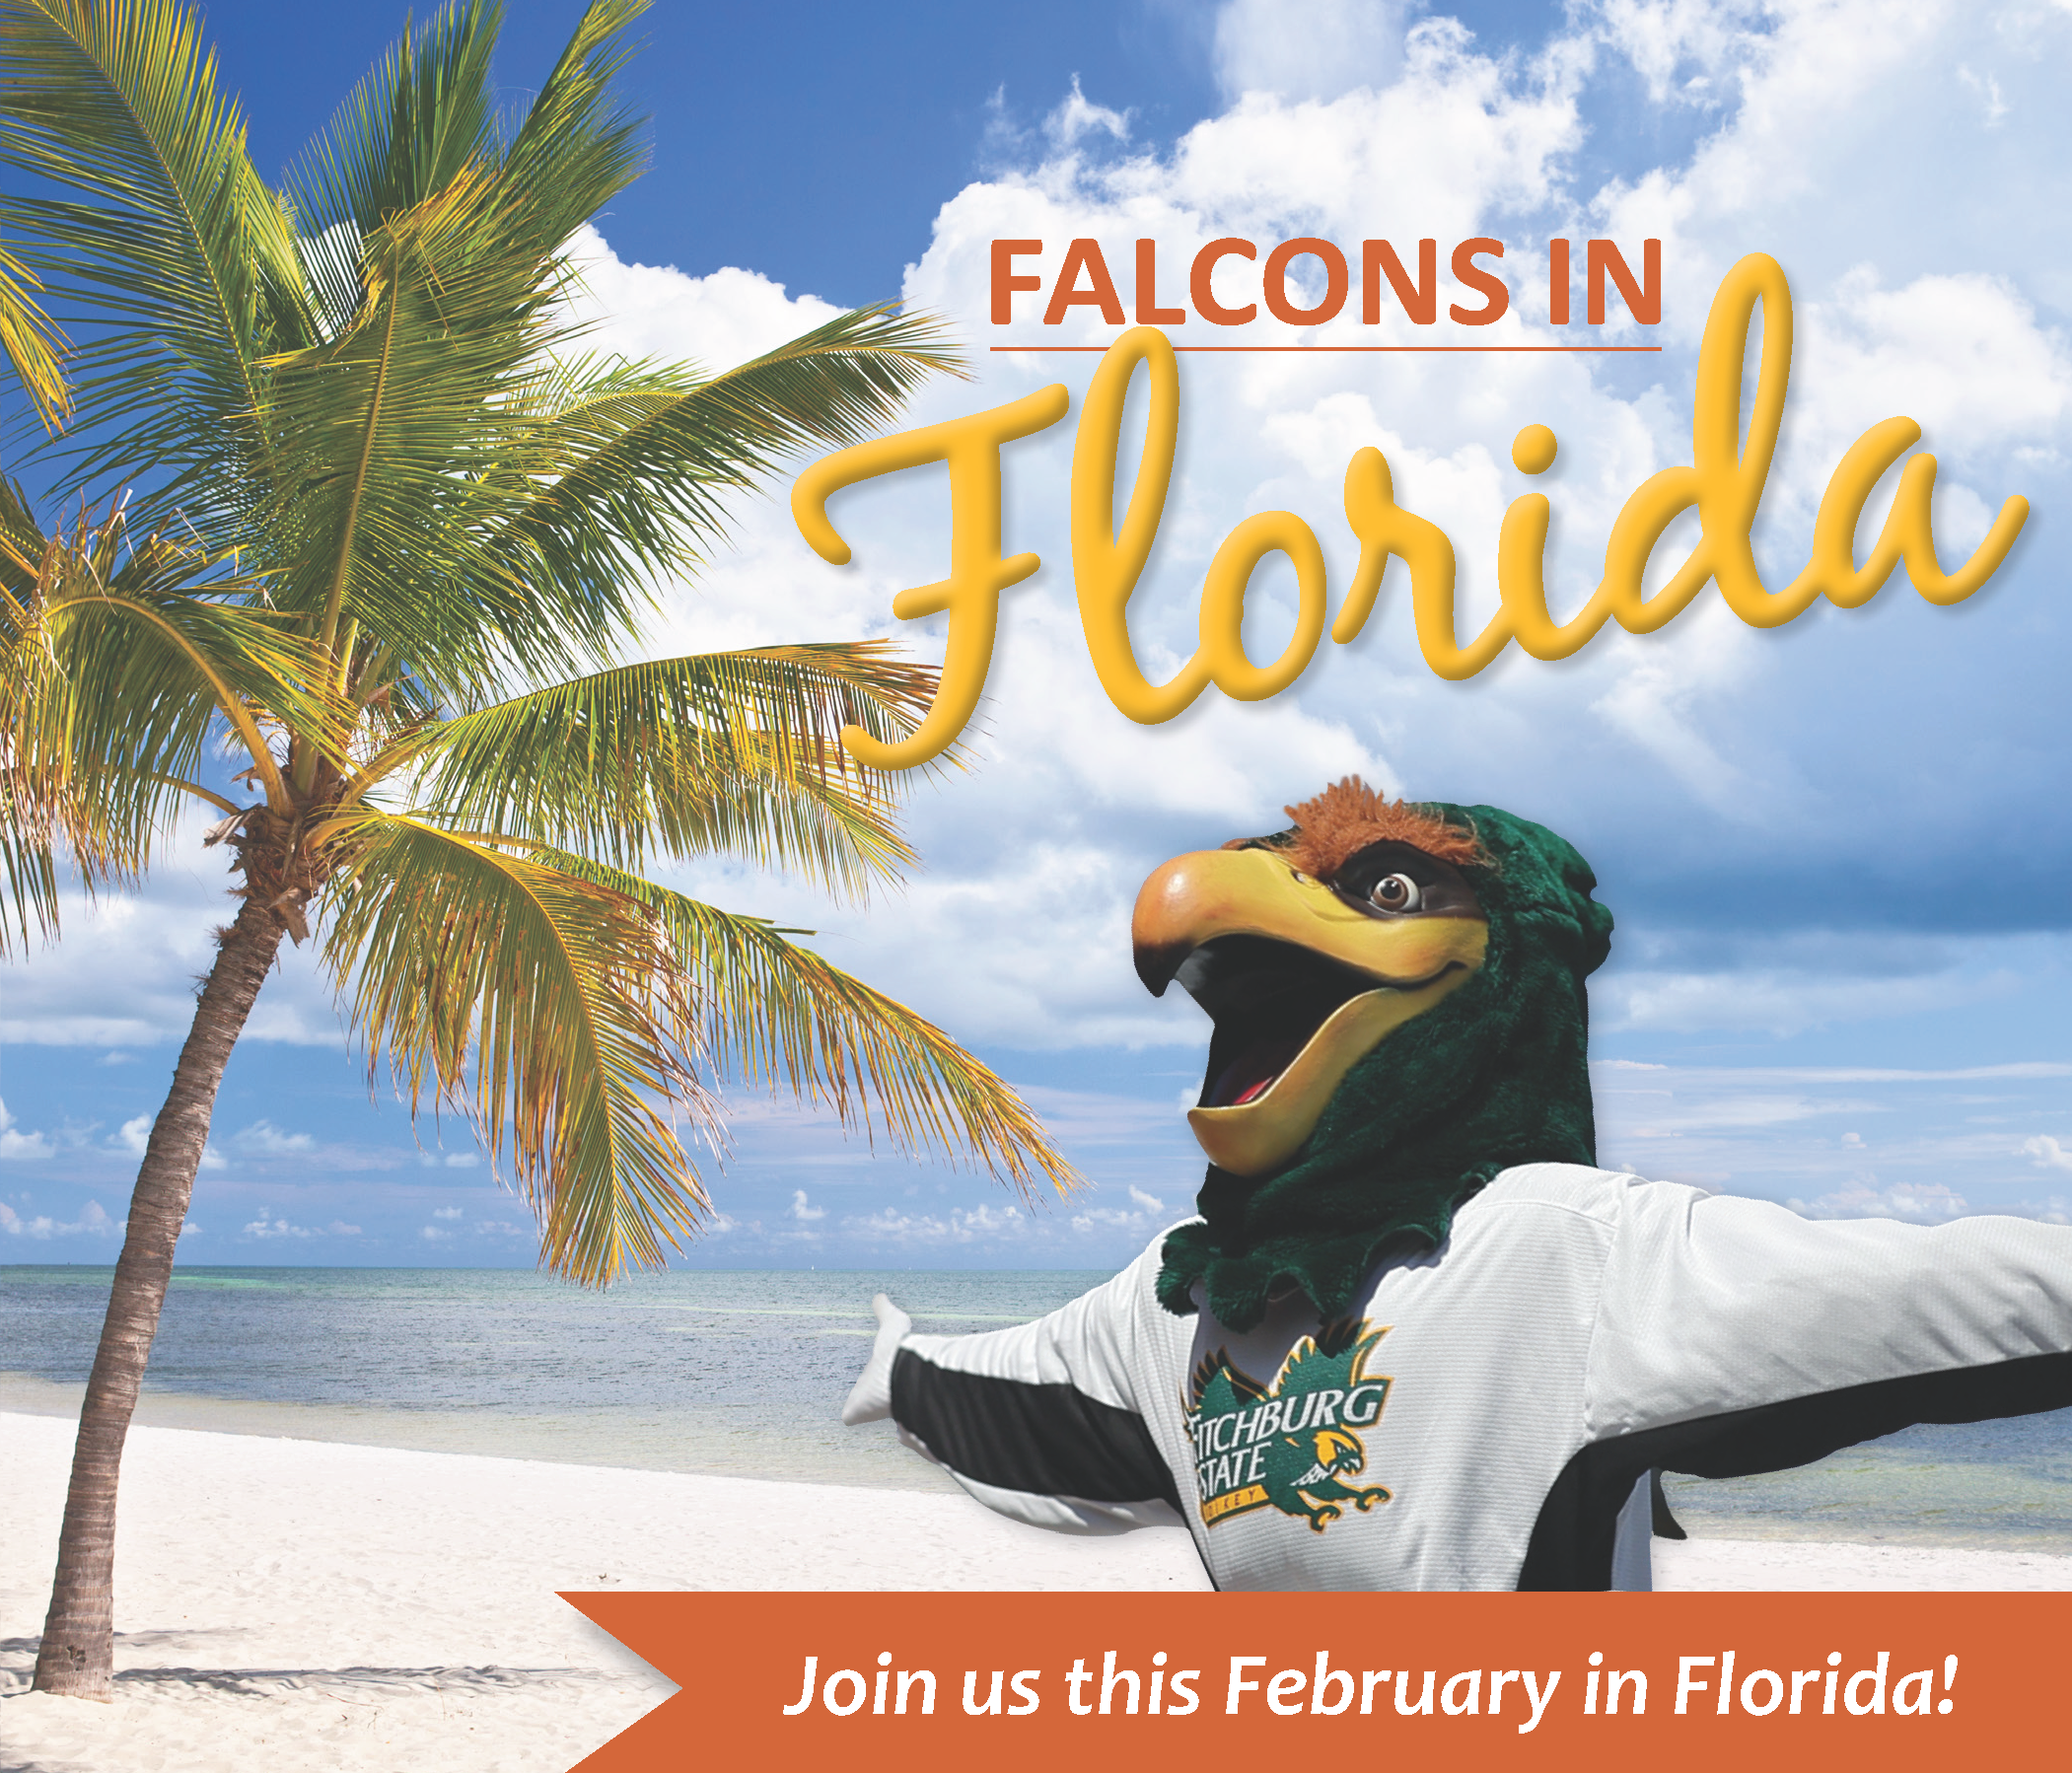 Falcons in Florida 2020